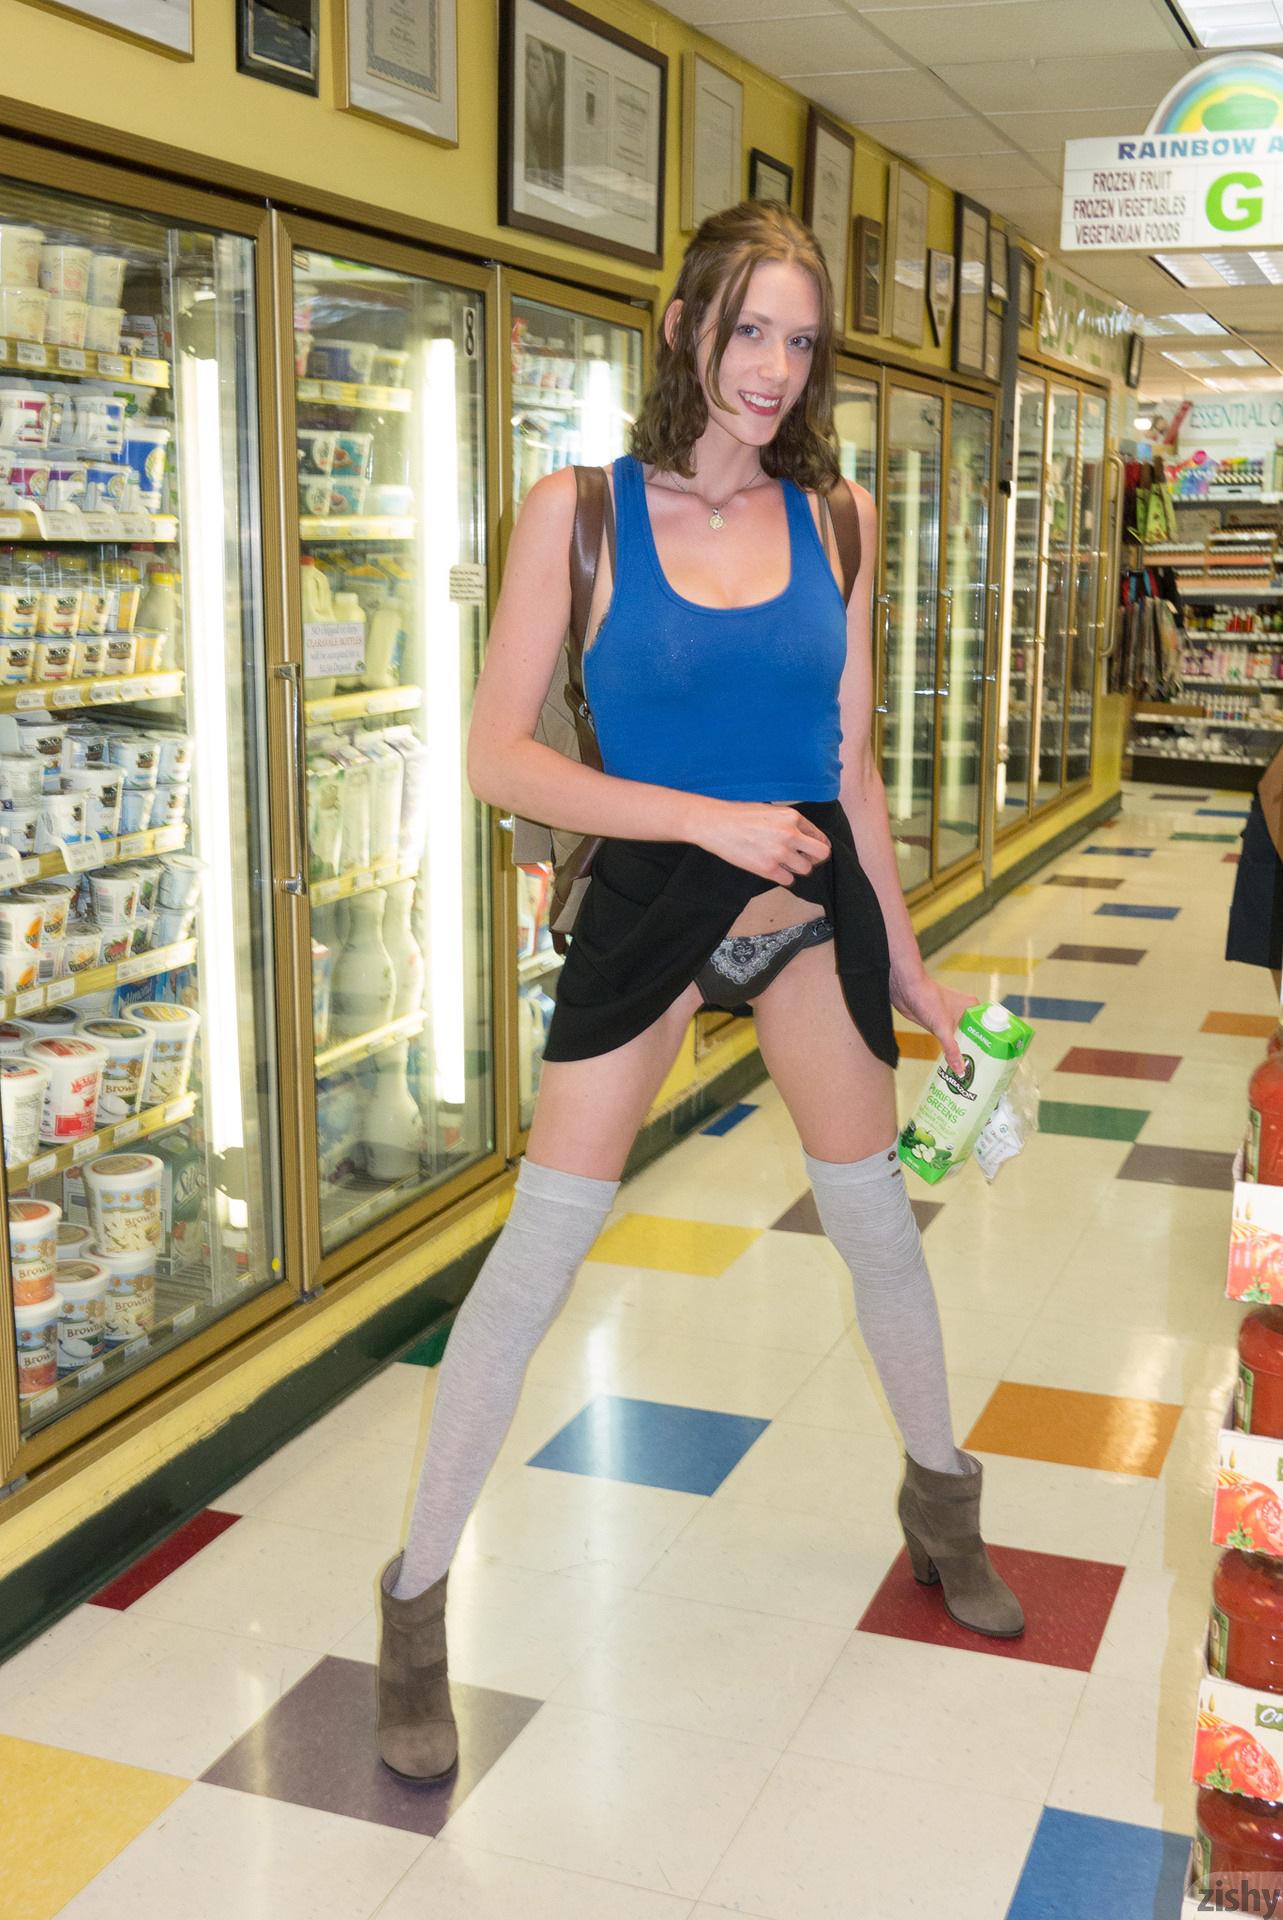 http://images.sexyteenheat.com/403/143631/f7257bd401fa60b1bf4f6427c406fc25/1296611.jpg